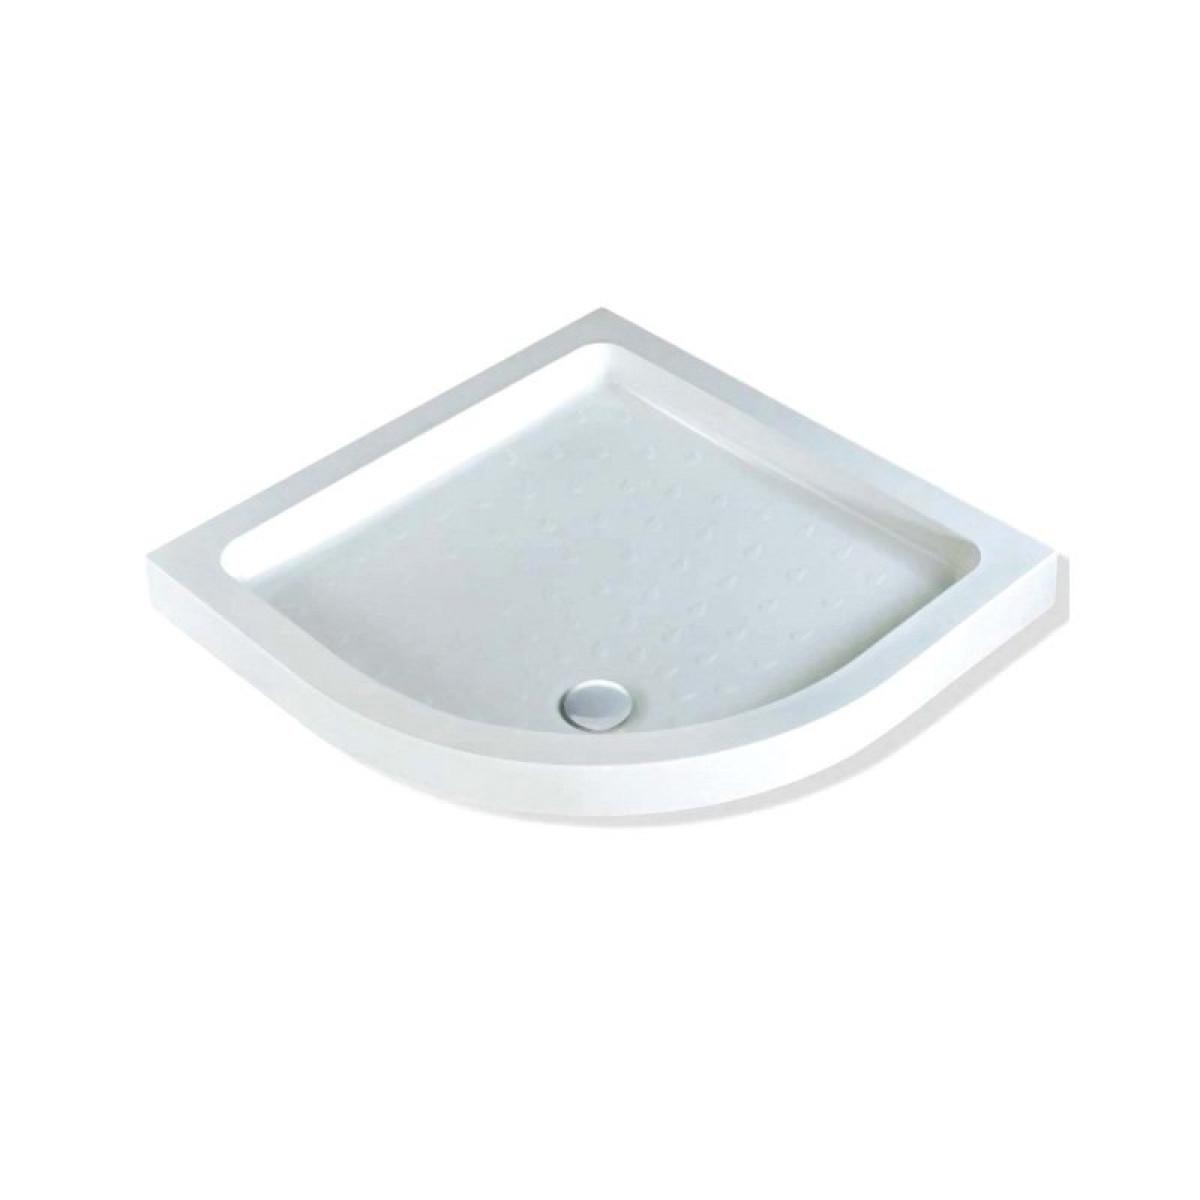 MX Classic Stone Resin Quadrant Shower Tray 900 X 900mm